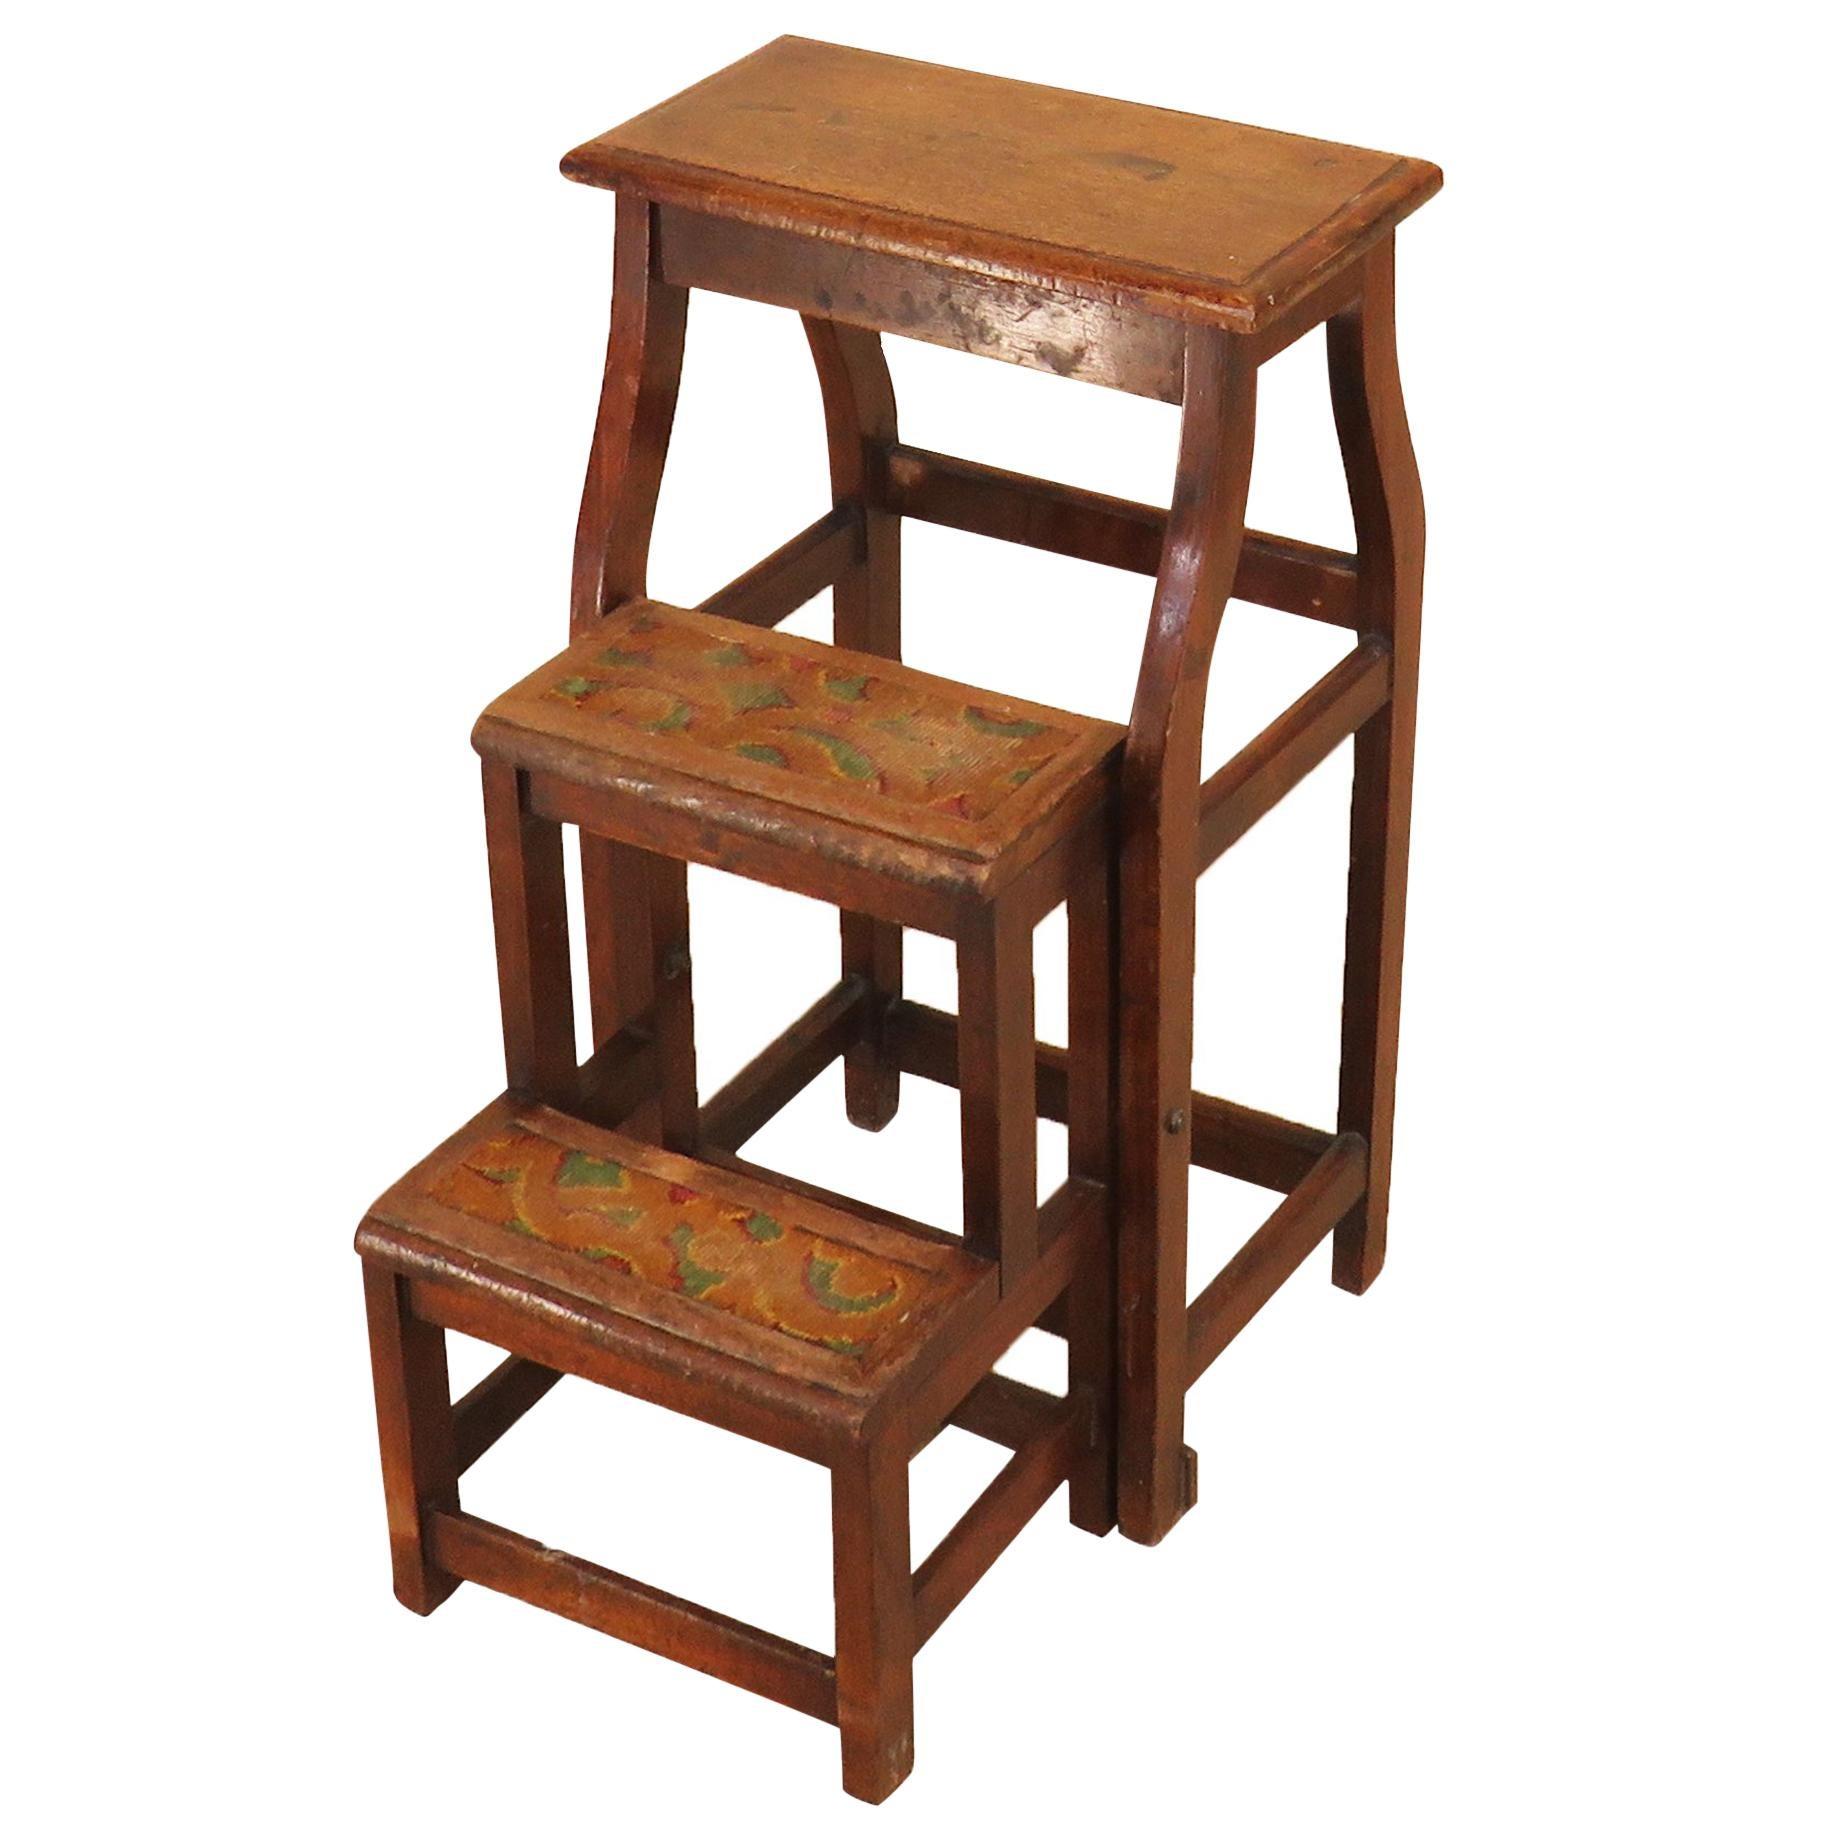 Antique Furniture 2019 Latest Design Edwardian Step Stool